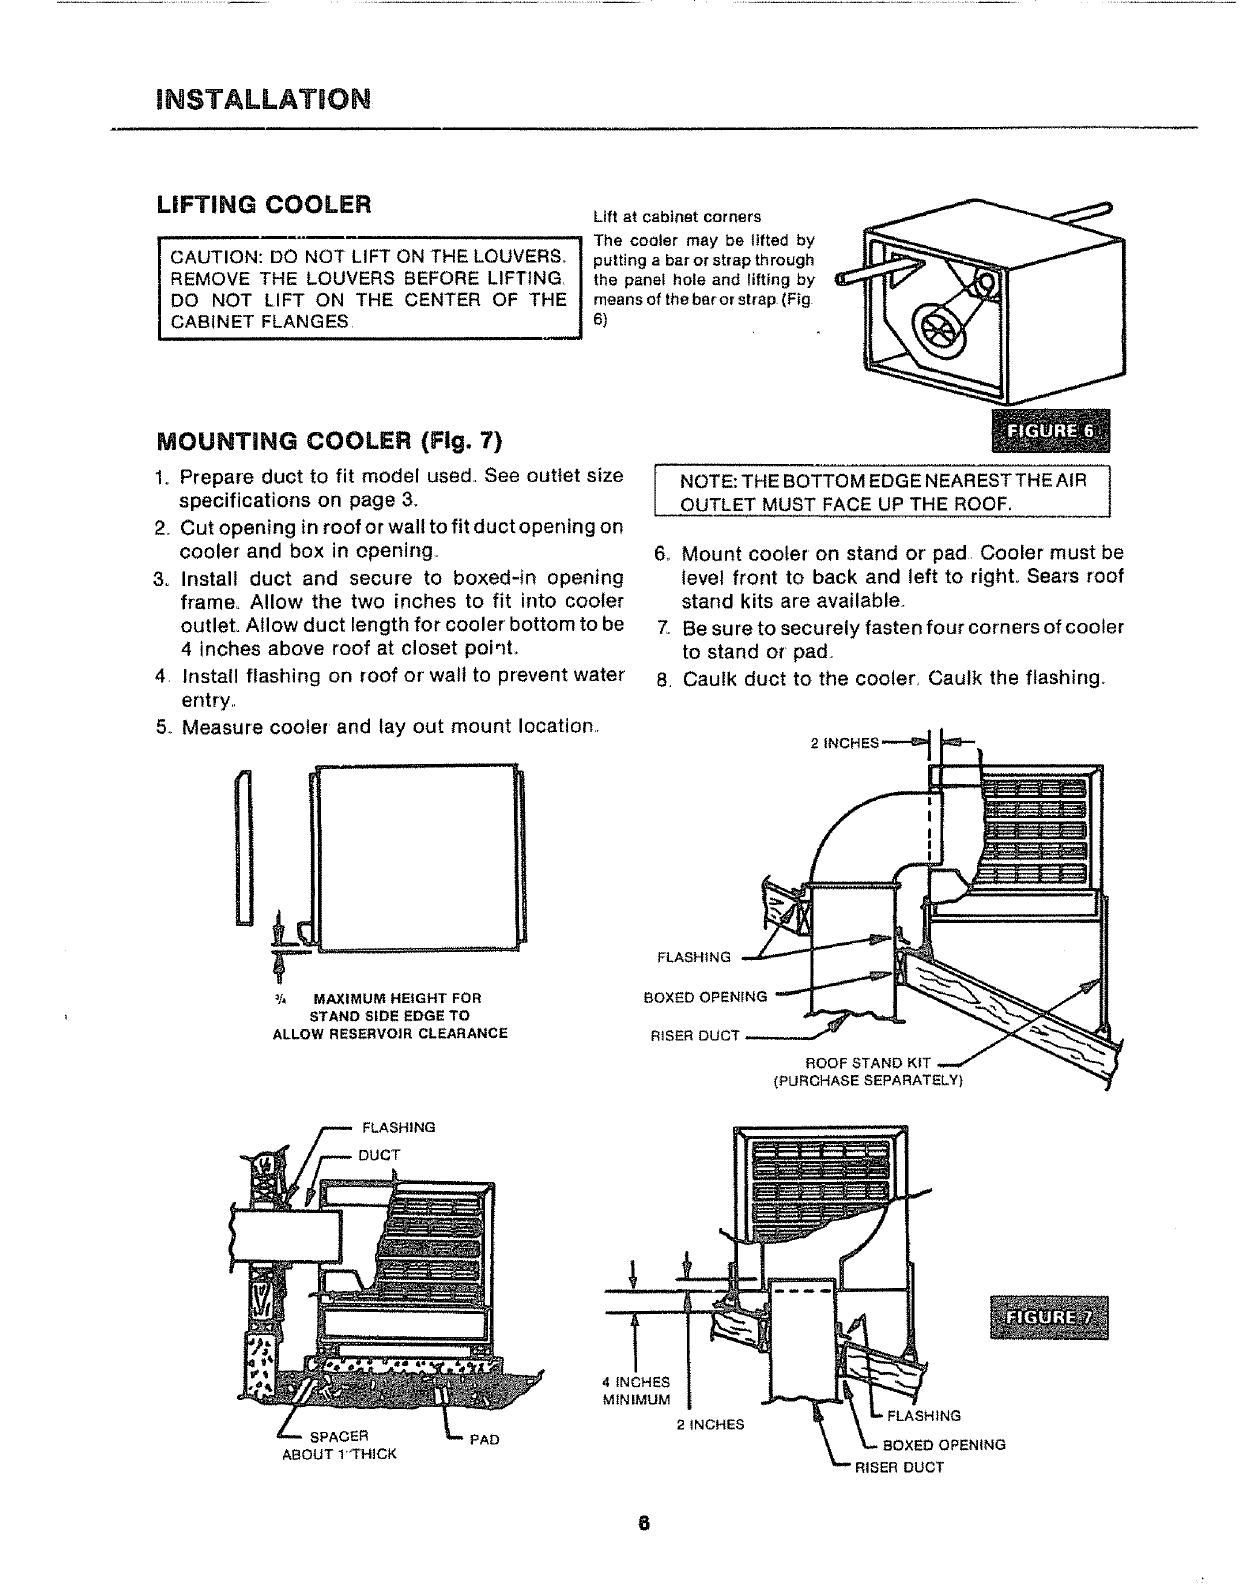 Handleiding Kenmore 661 623920 (pagina 1 van 16) (English)